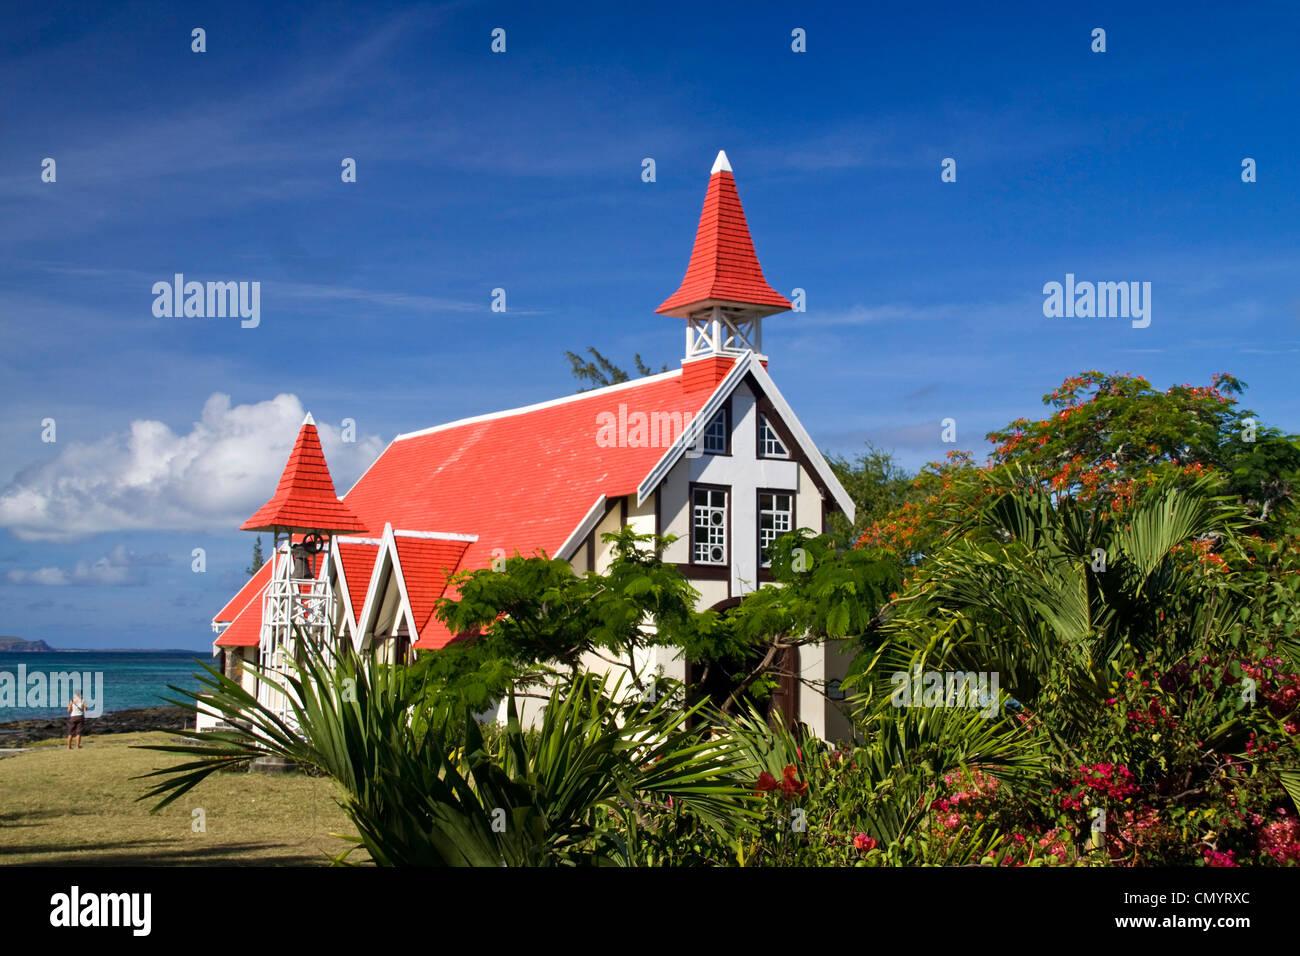 Eglise de Cap Malheureux, Mauritius, Africa Stock Photo